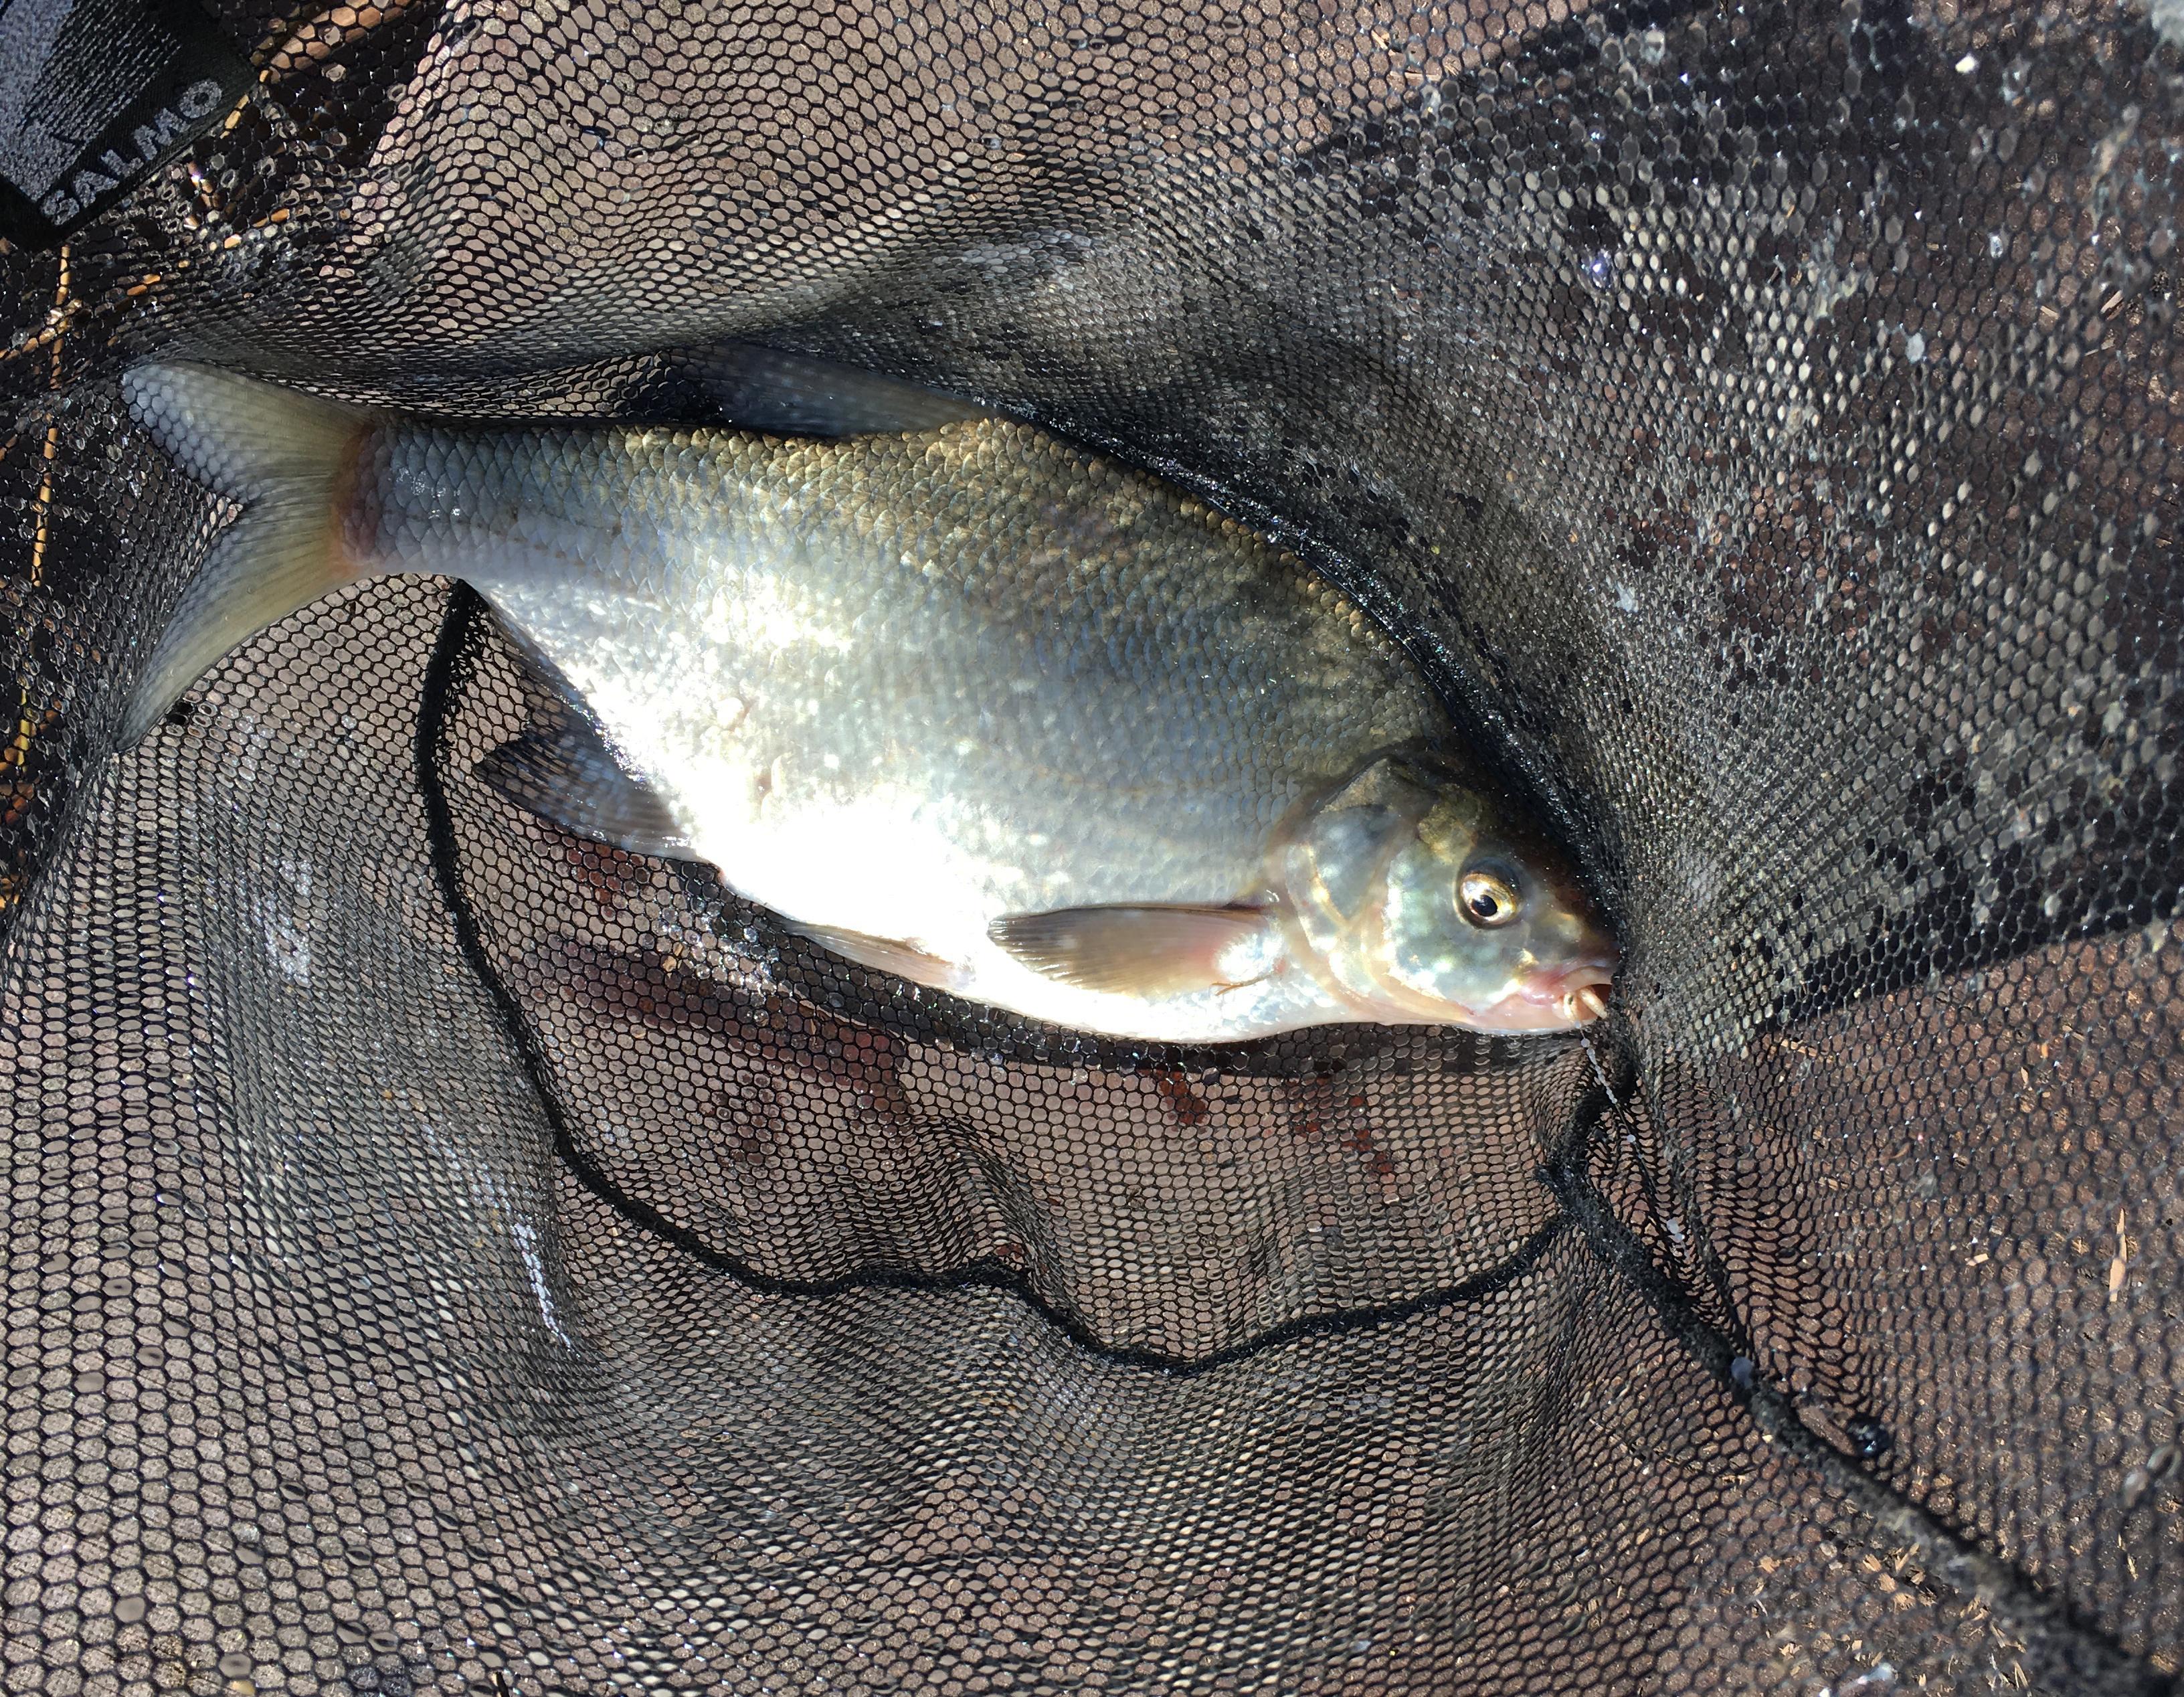 рыбалка Юрмала Латвия Лиелупе пейзажи природы лещ Альберт Сафиуллин Albert Safiullin